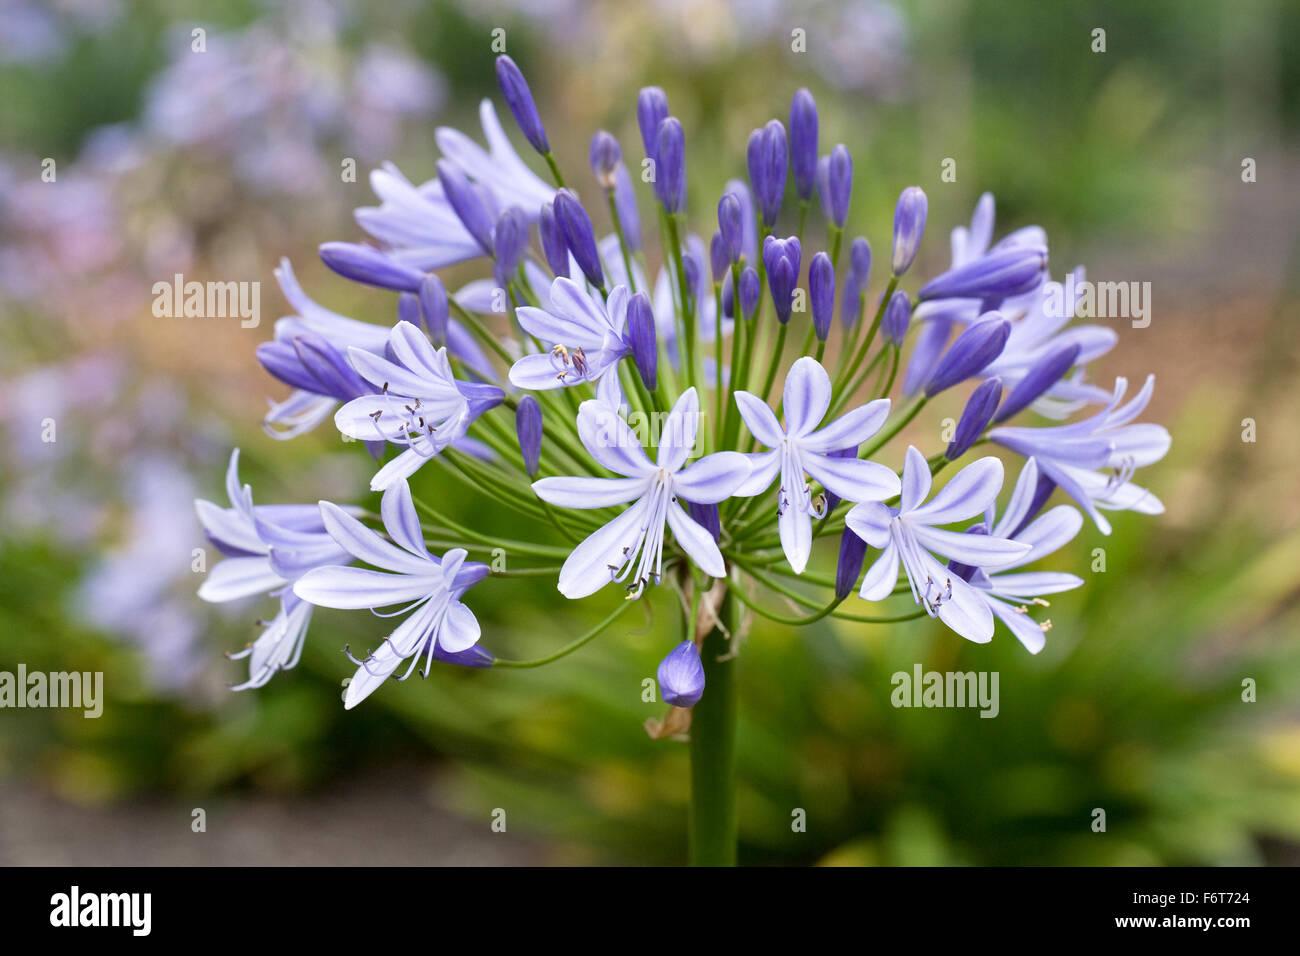 Lavendar Blue Flowers Close Up Stock Photos Lavendar Blue Flowers